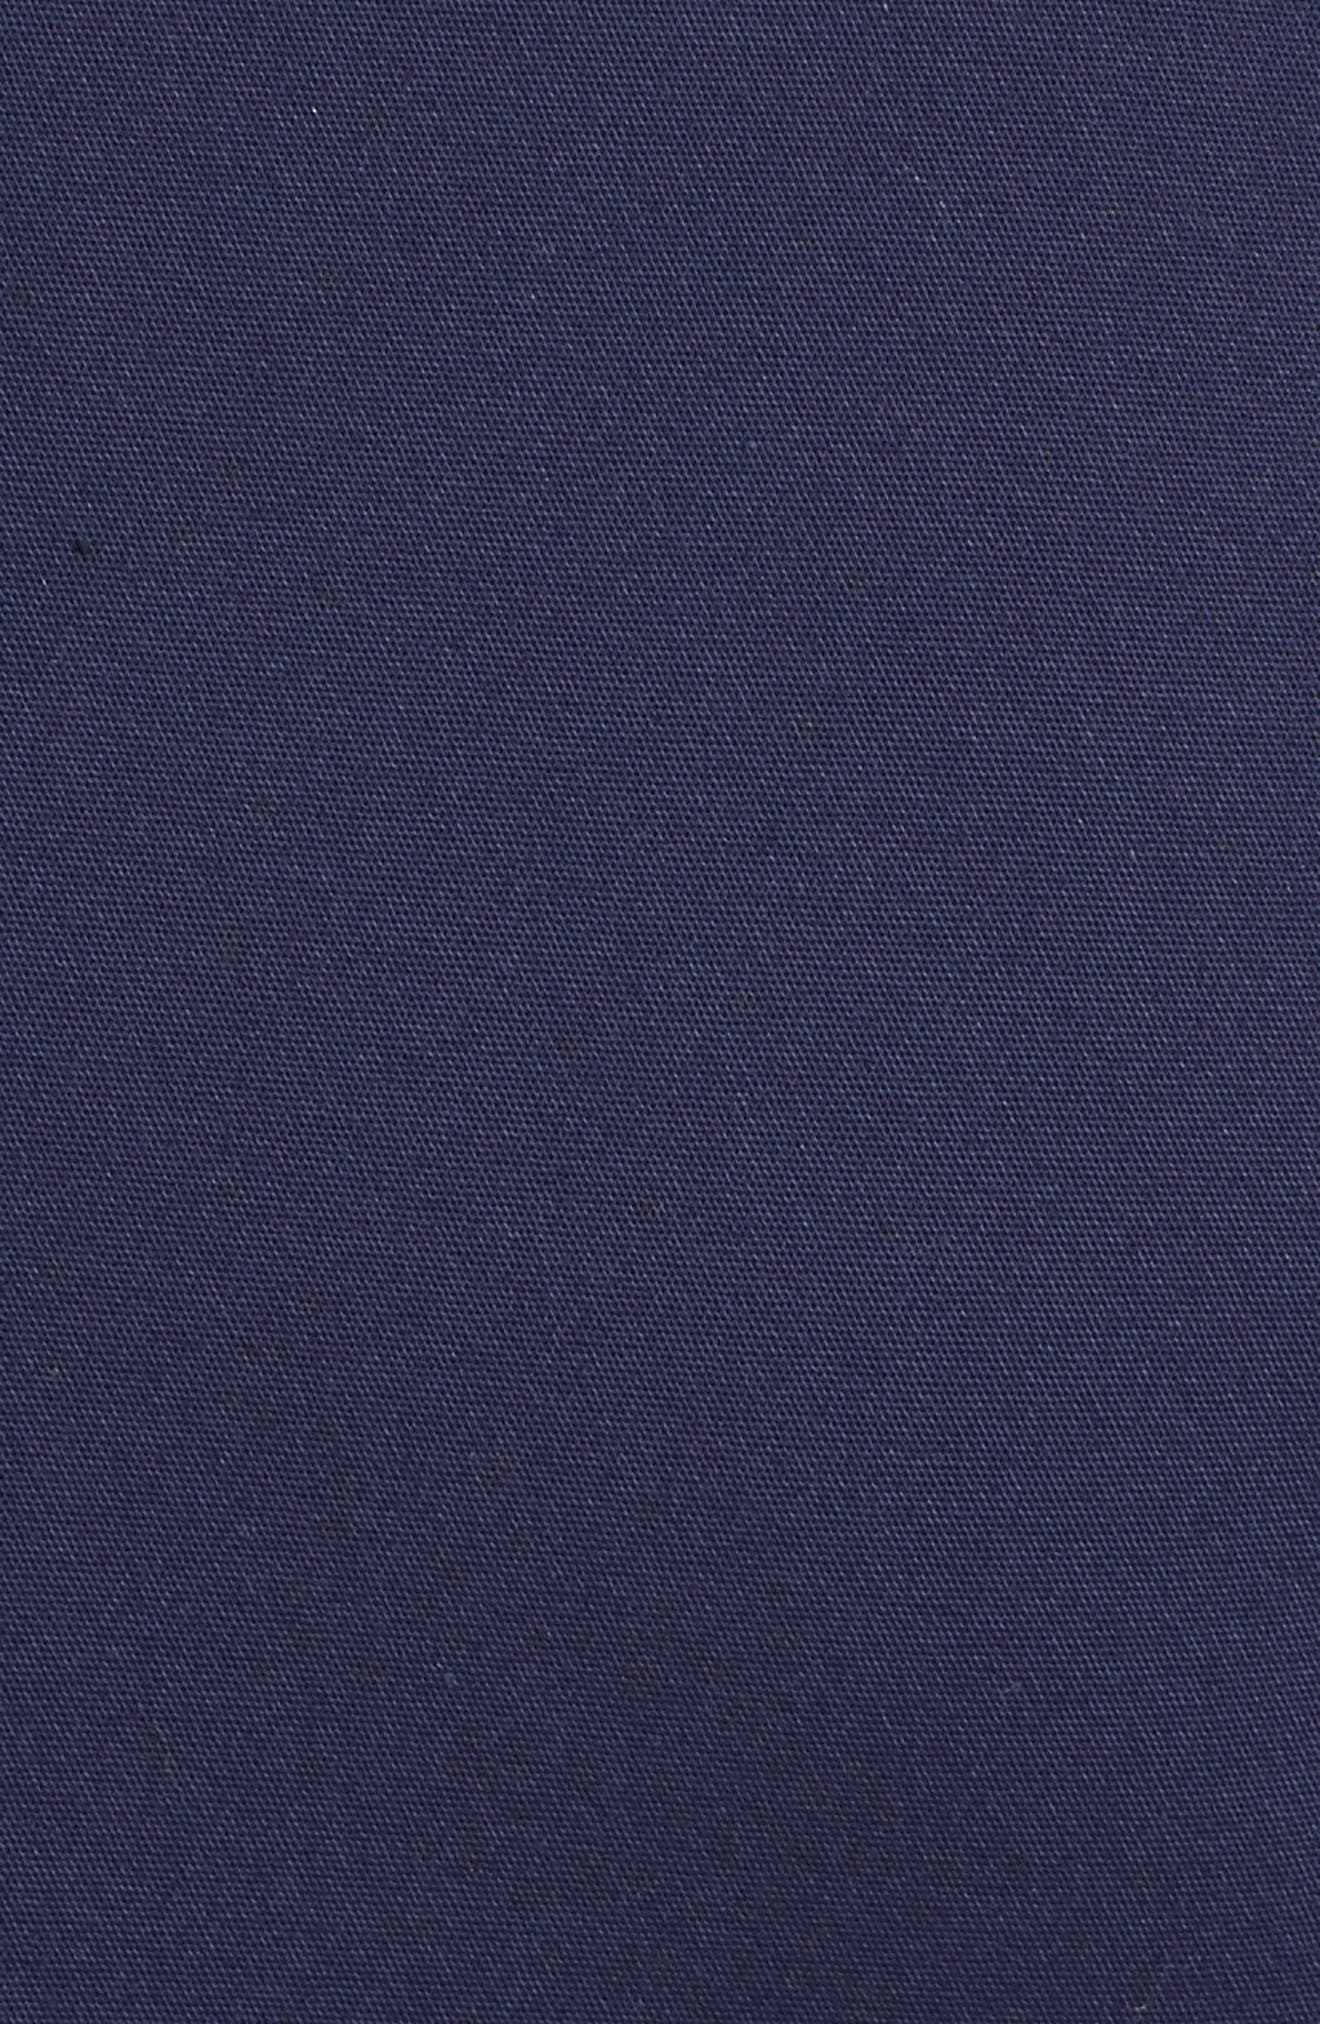 Cotton Blend Sheath Dress,                             Alternate thumbnail 5, color,                             400